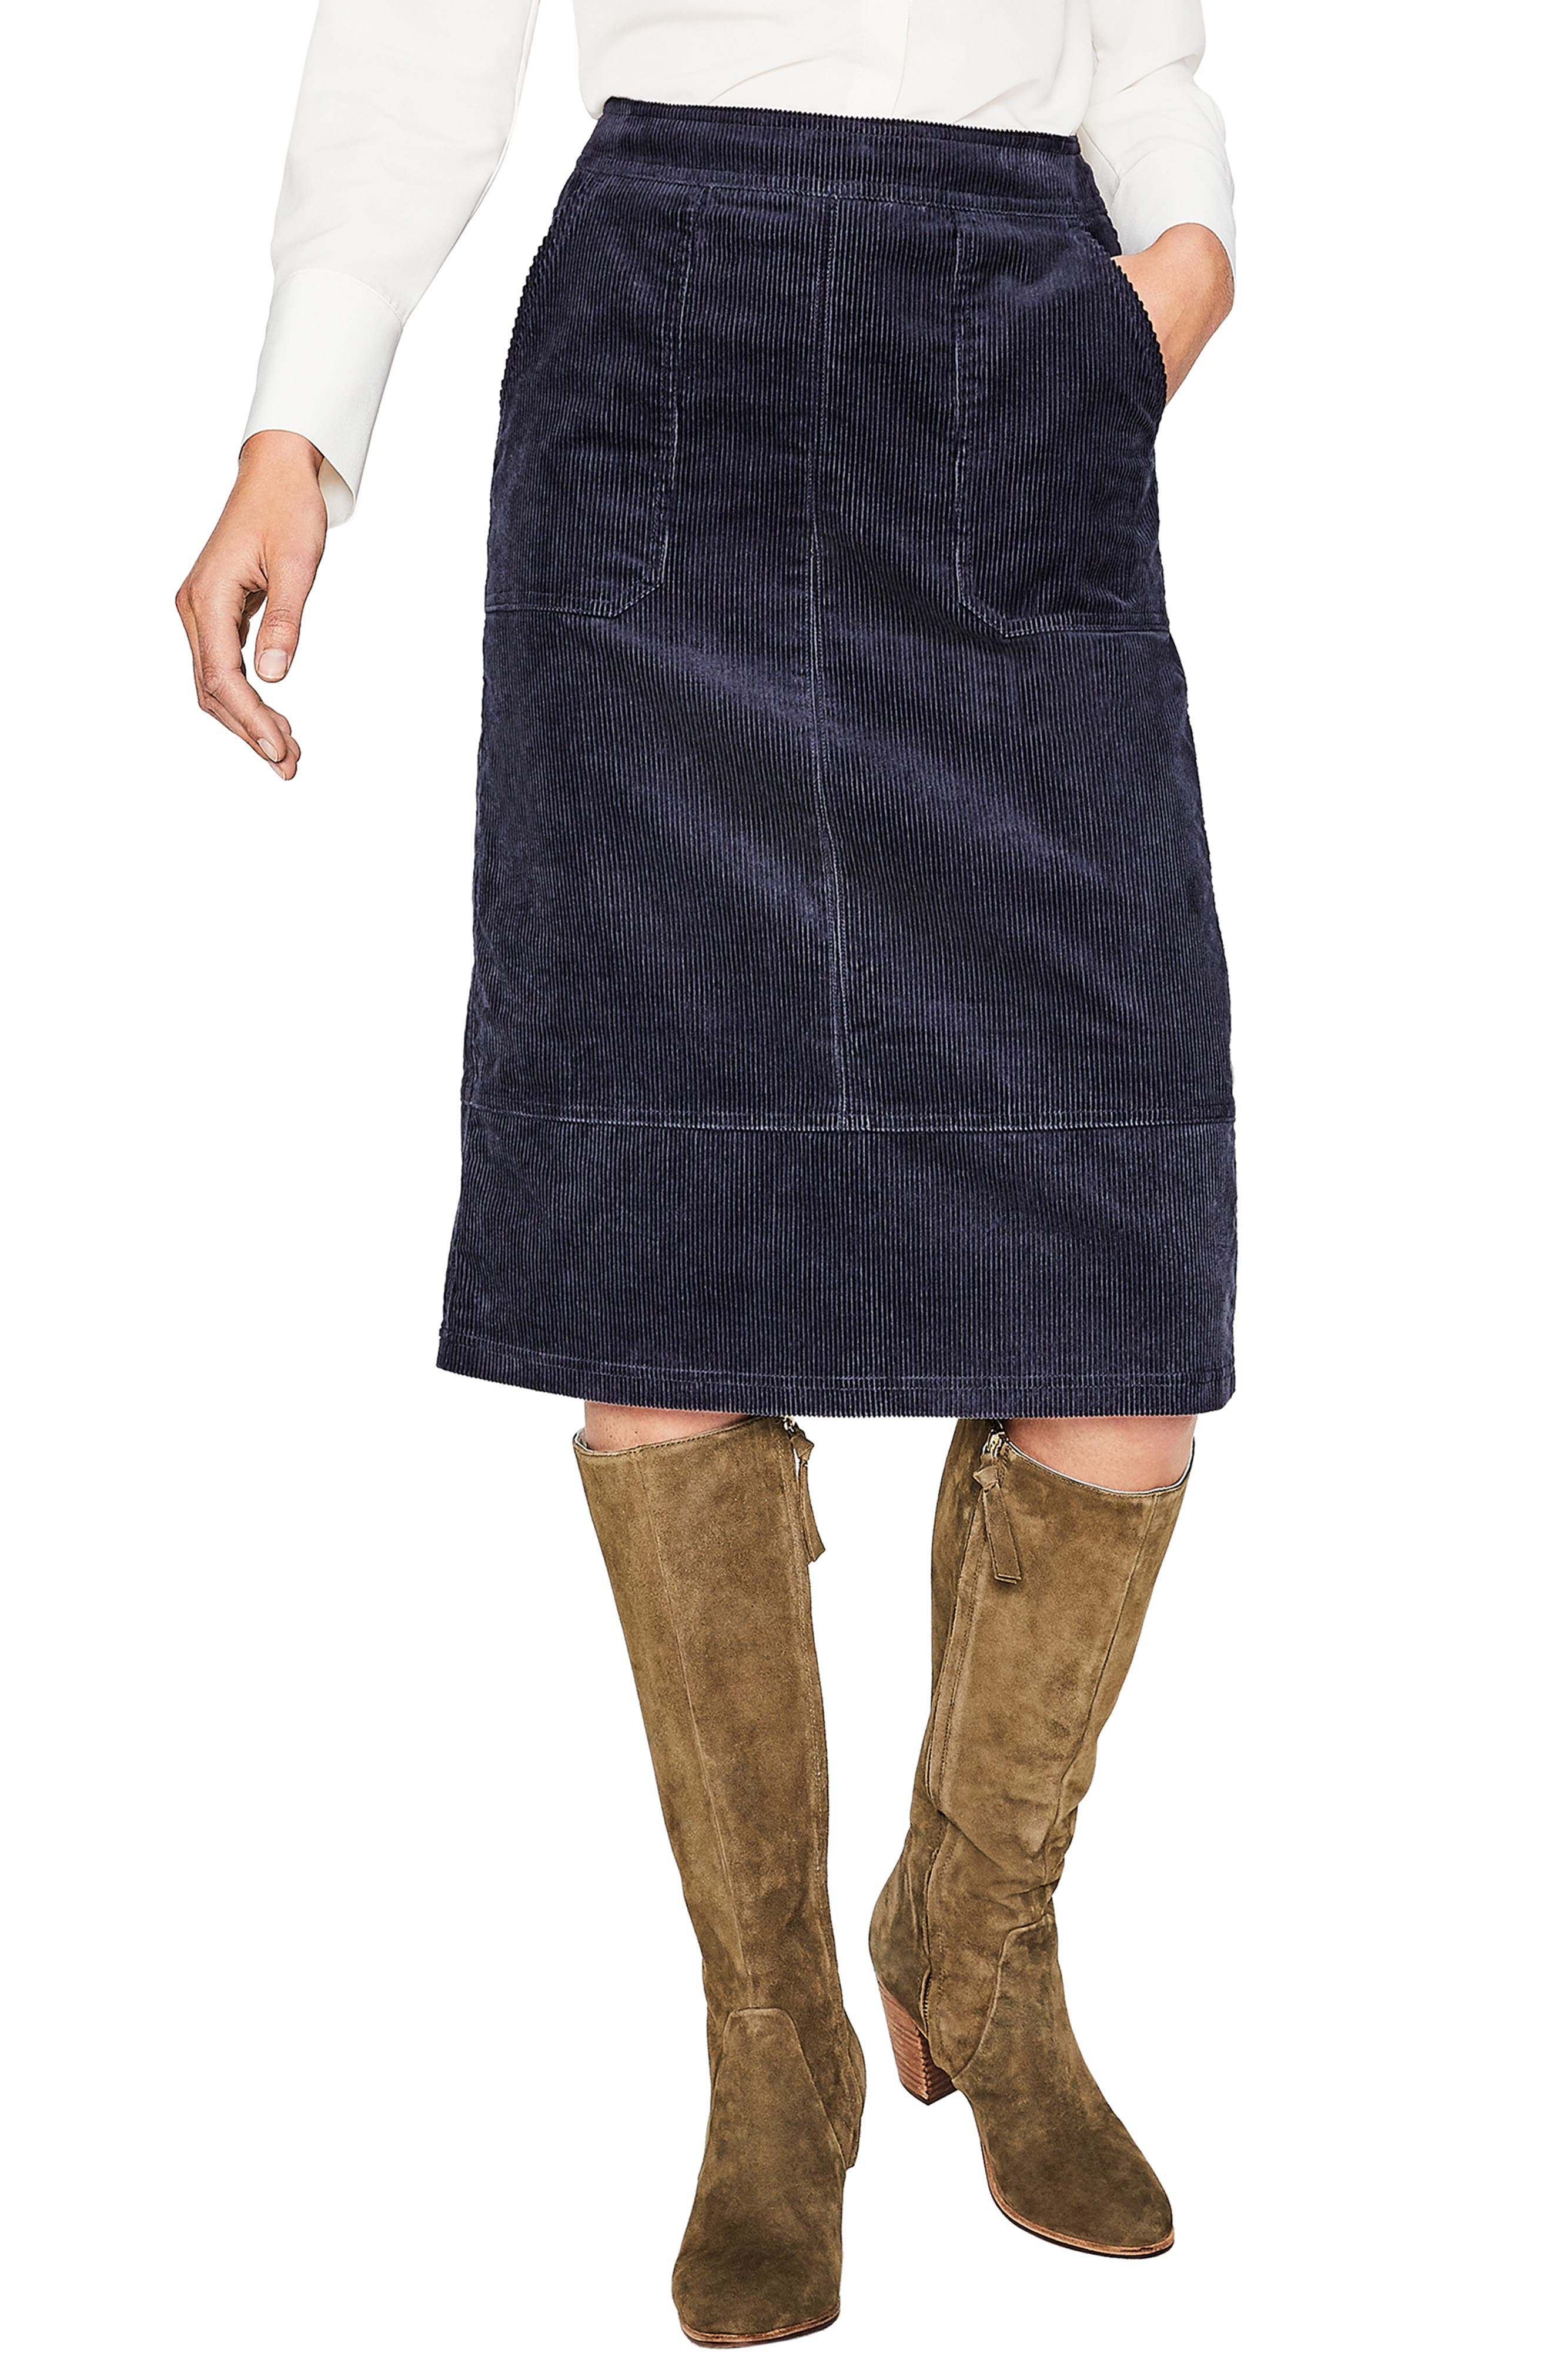 Patch Pocket Corduroy Midi Skirt,                             Main thumbnail 1, color,                             024